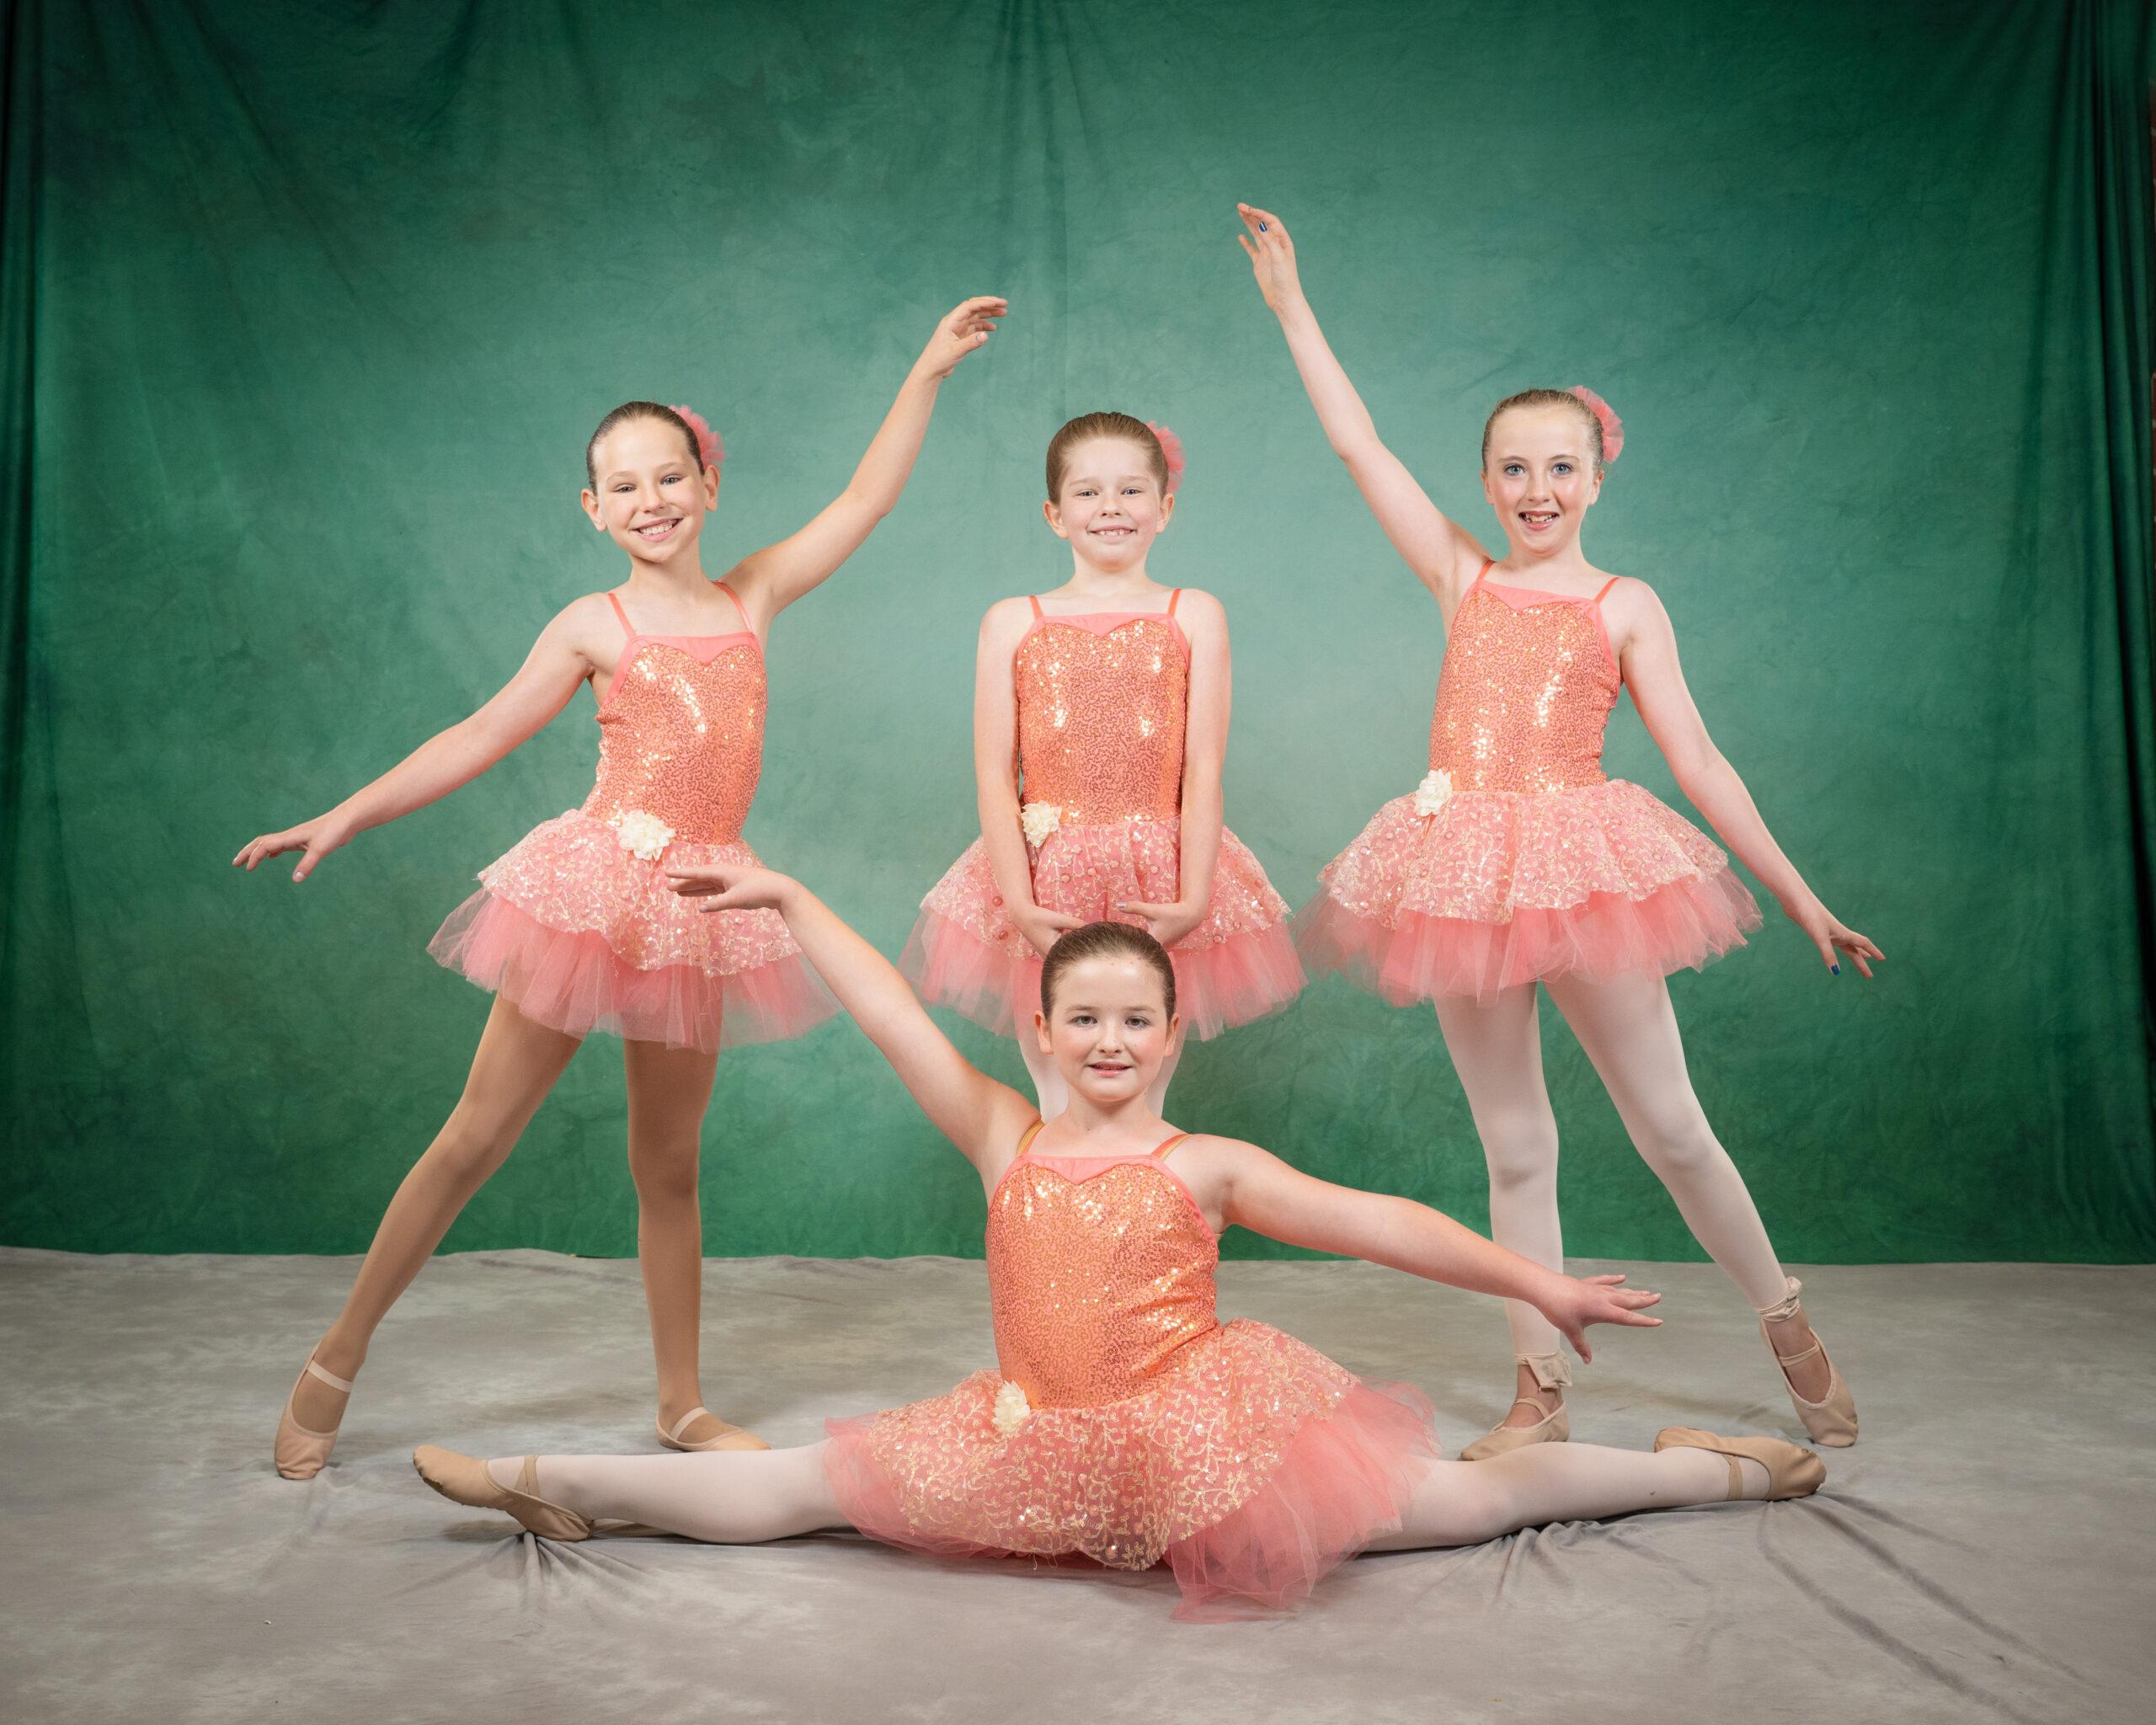 ballet dancer standing in attitude